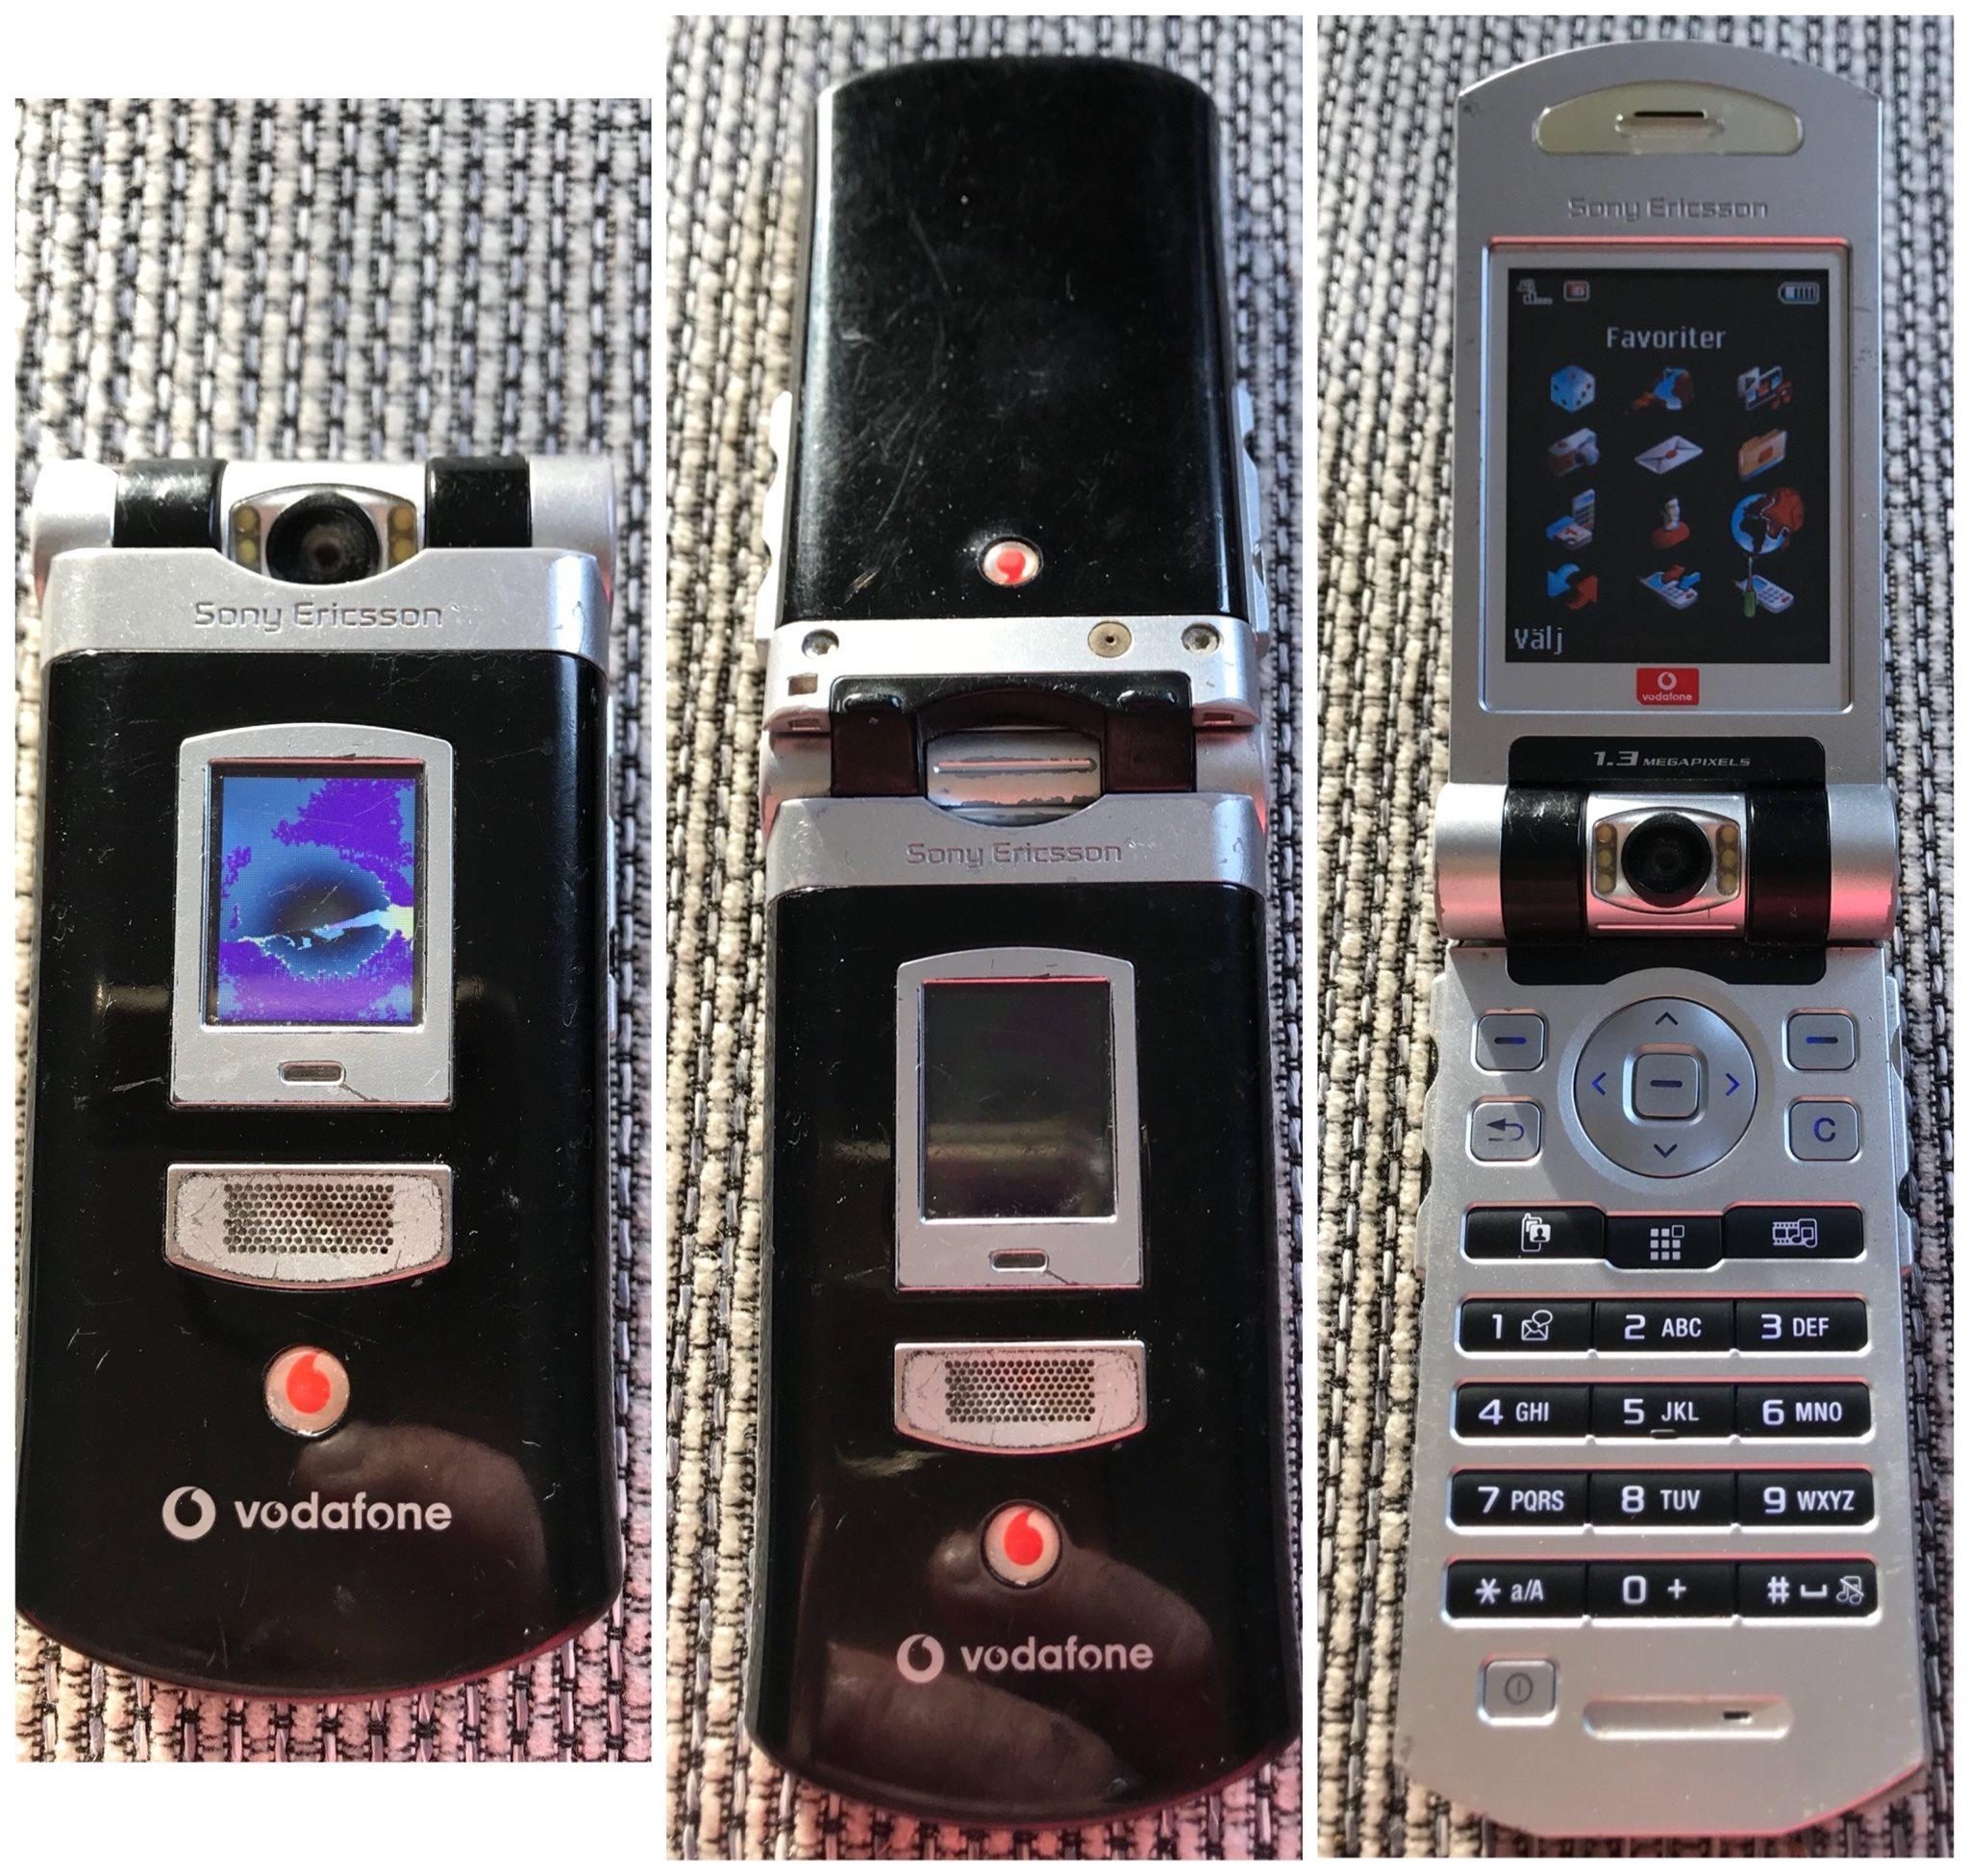 sony ericsson mobiltelefoner